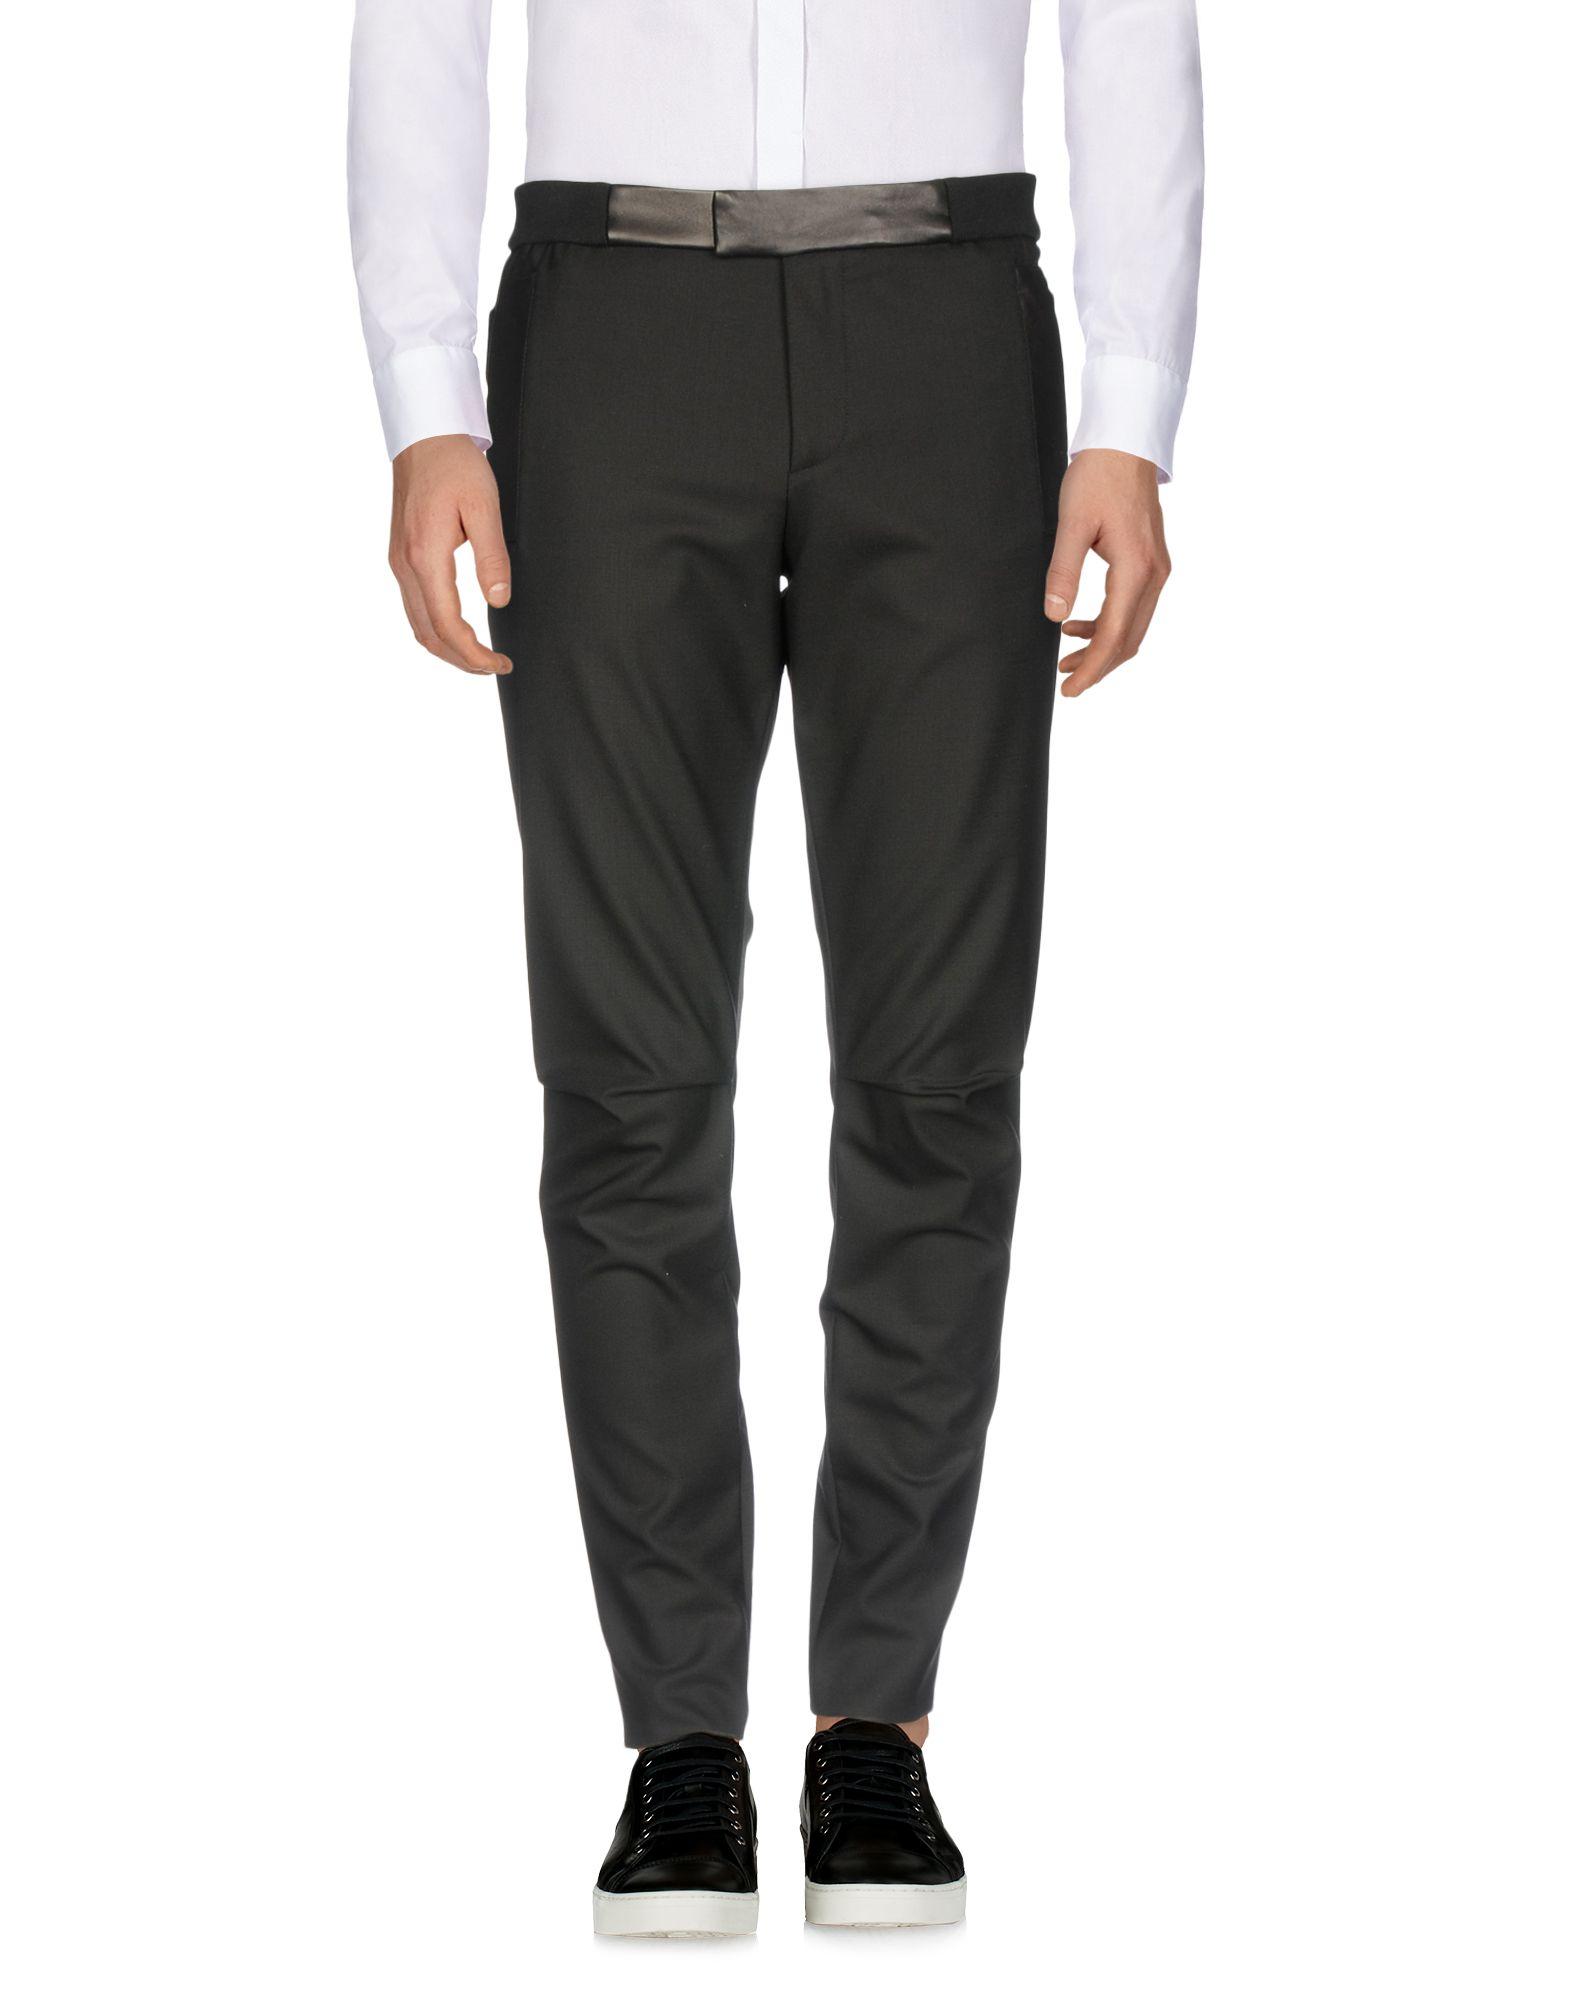 Pantalone Les Hommes Donna - Acquista online su